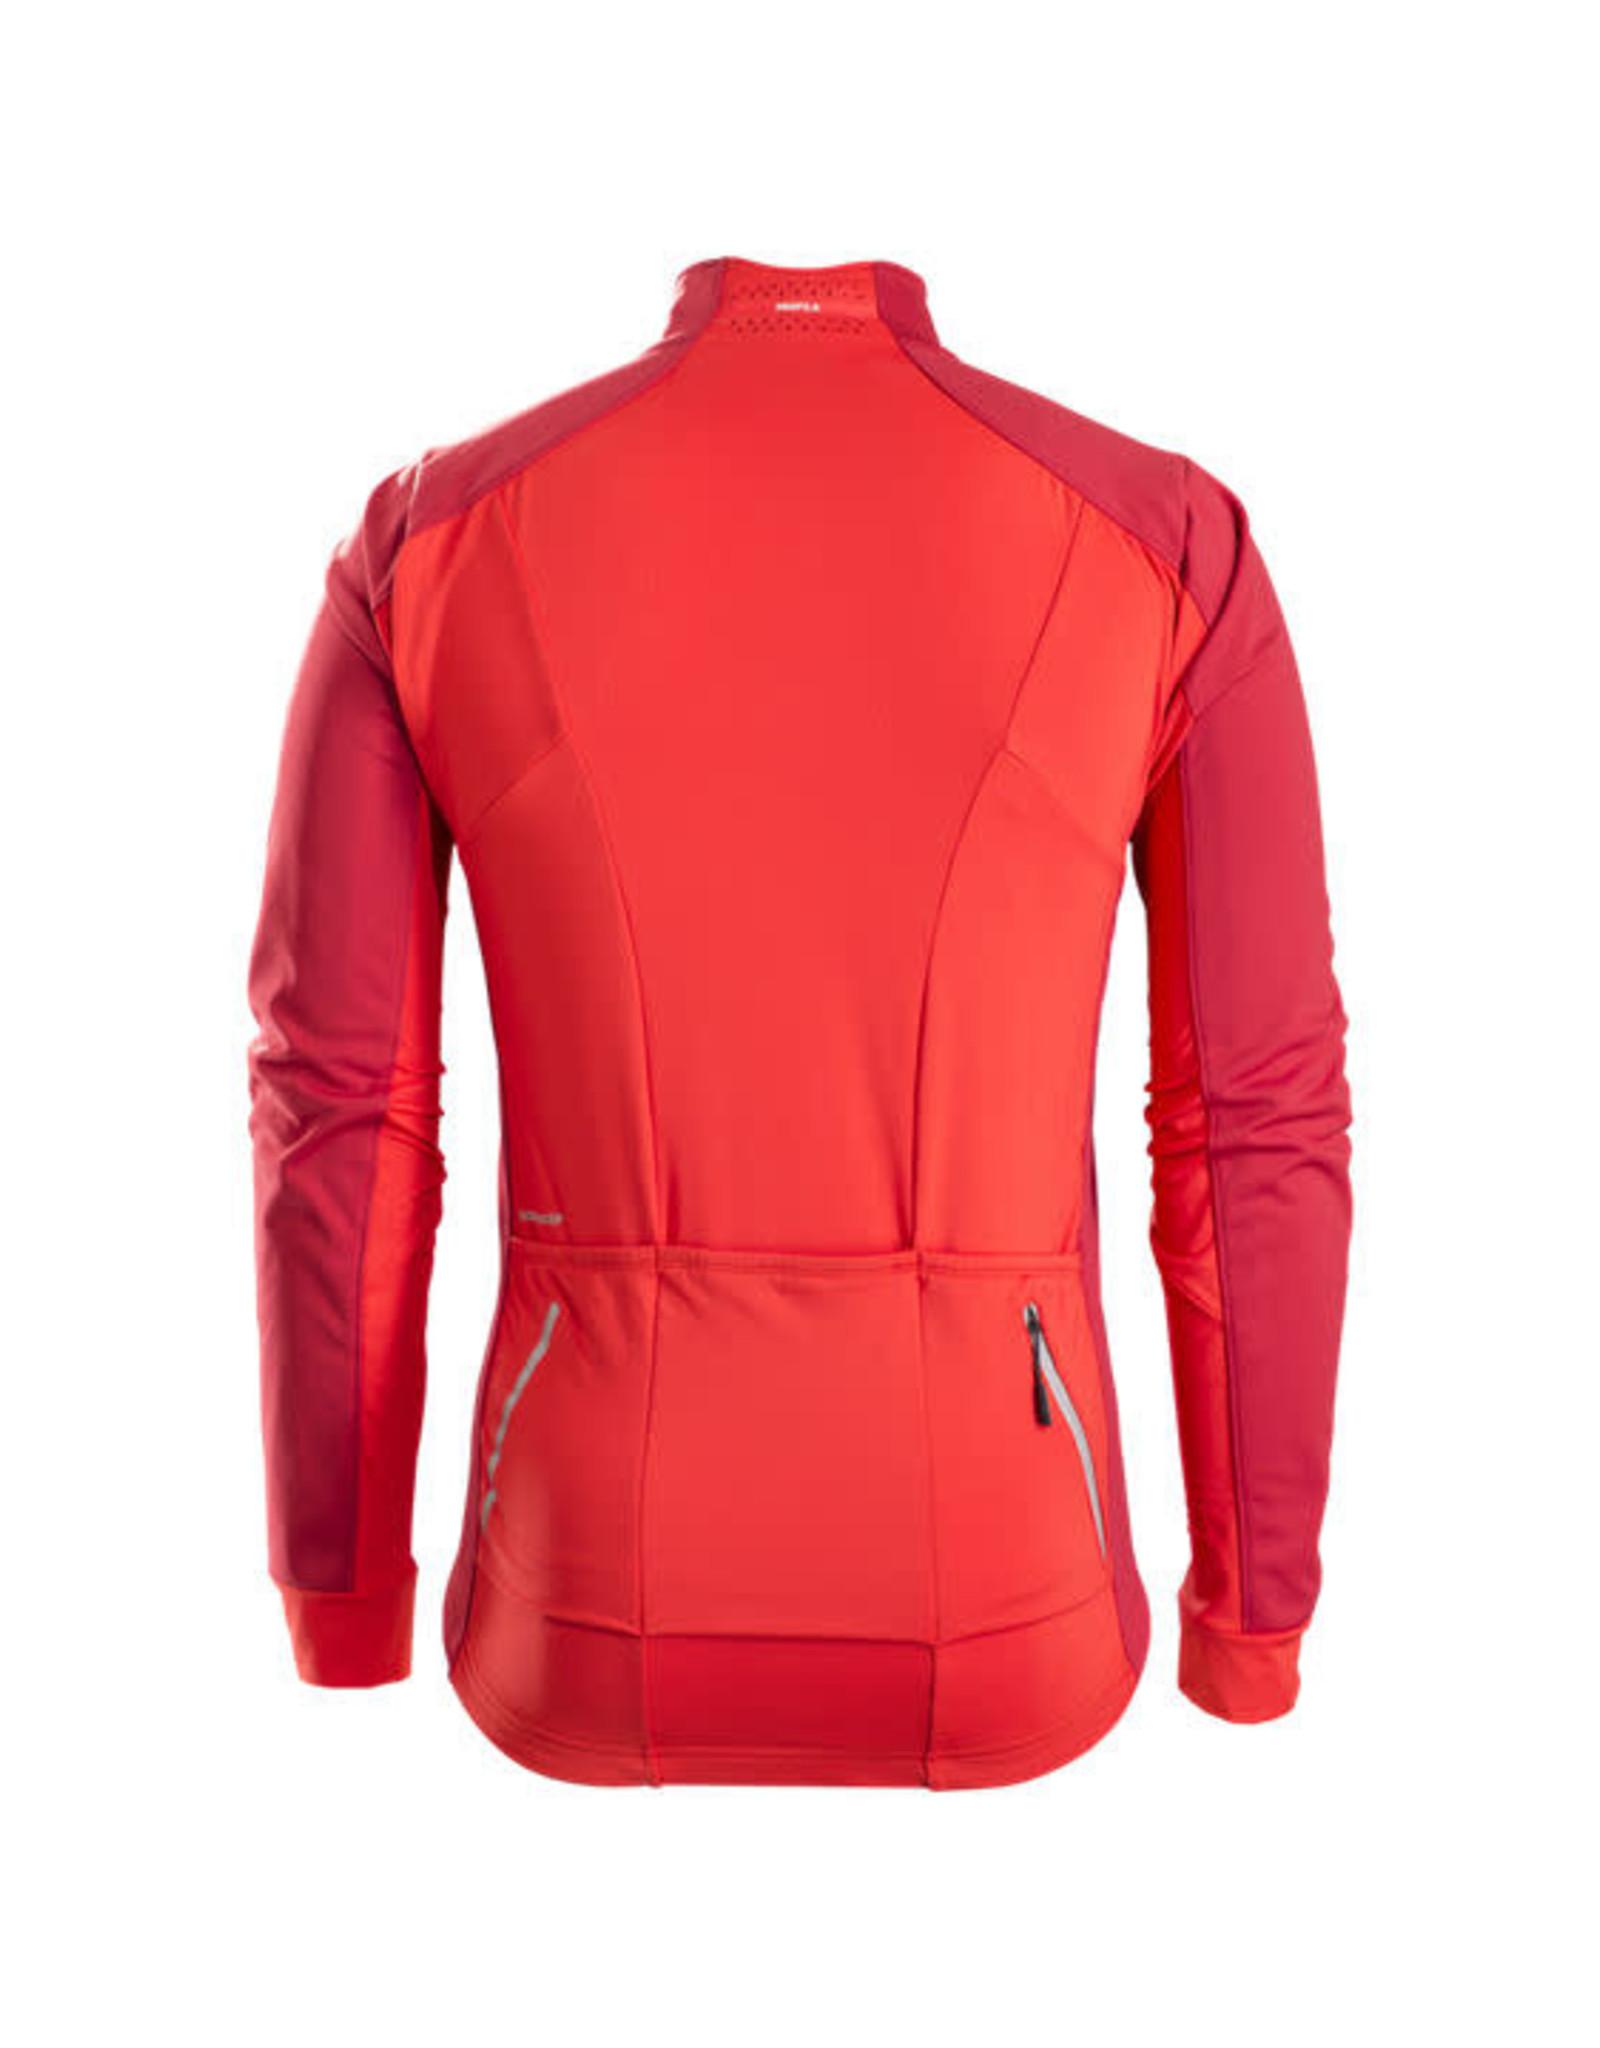 BONTRAGER Bontrager Velocis S1 Softshell Jacket/Jersey